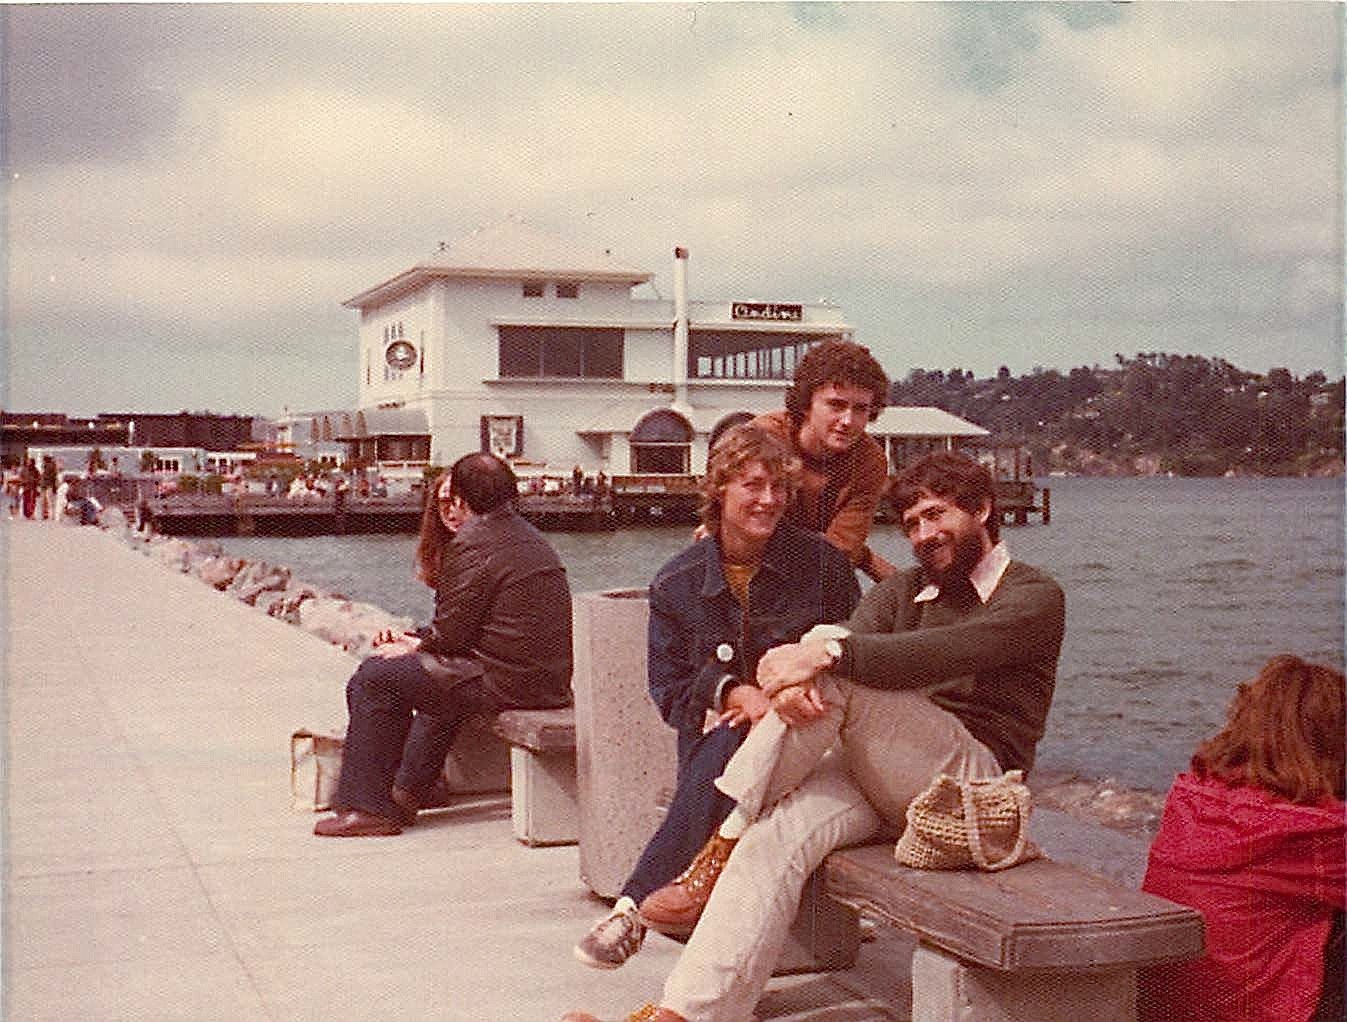 Cindy, Ann, & John Wagner, Aug. 1975 Sausalito, CA